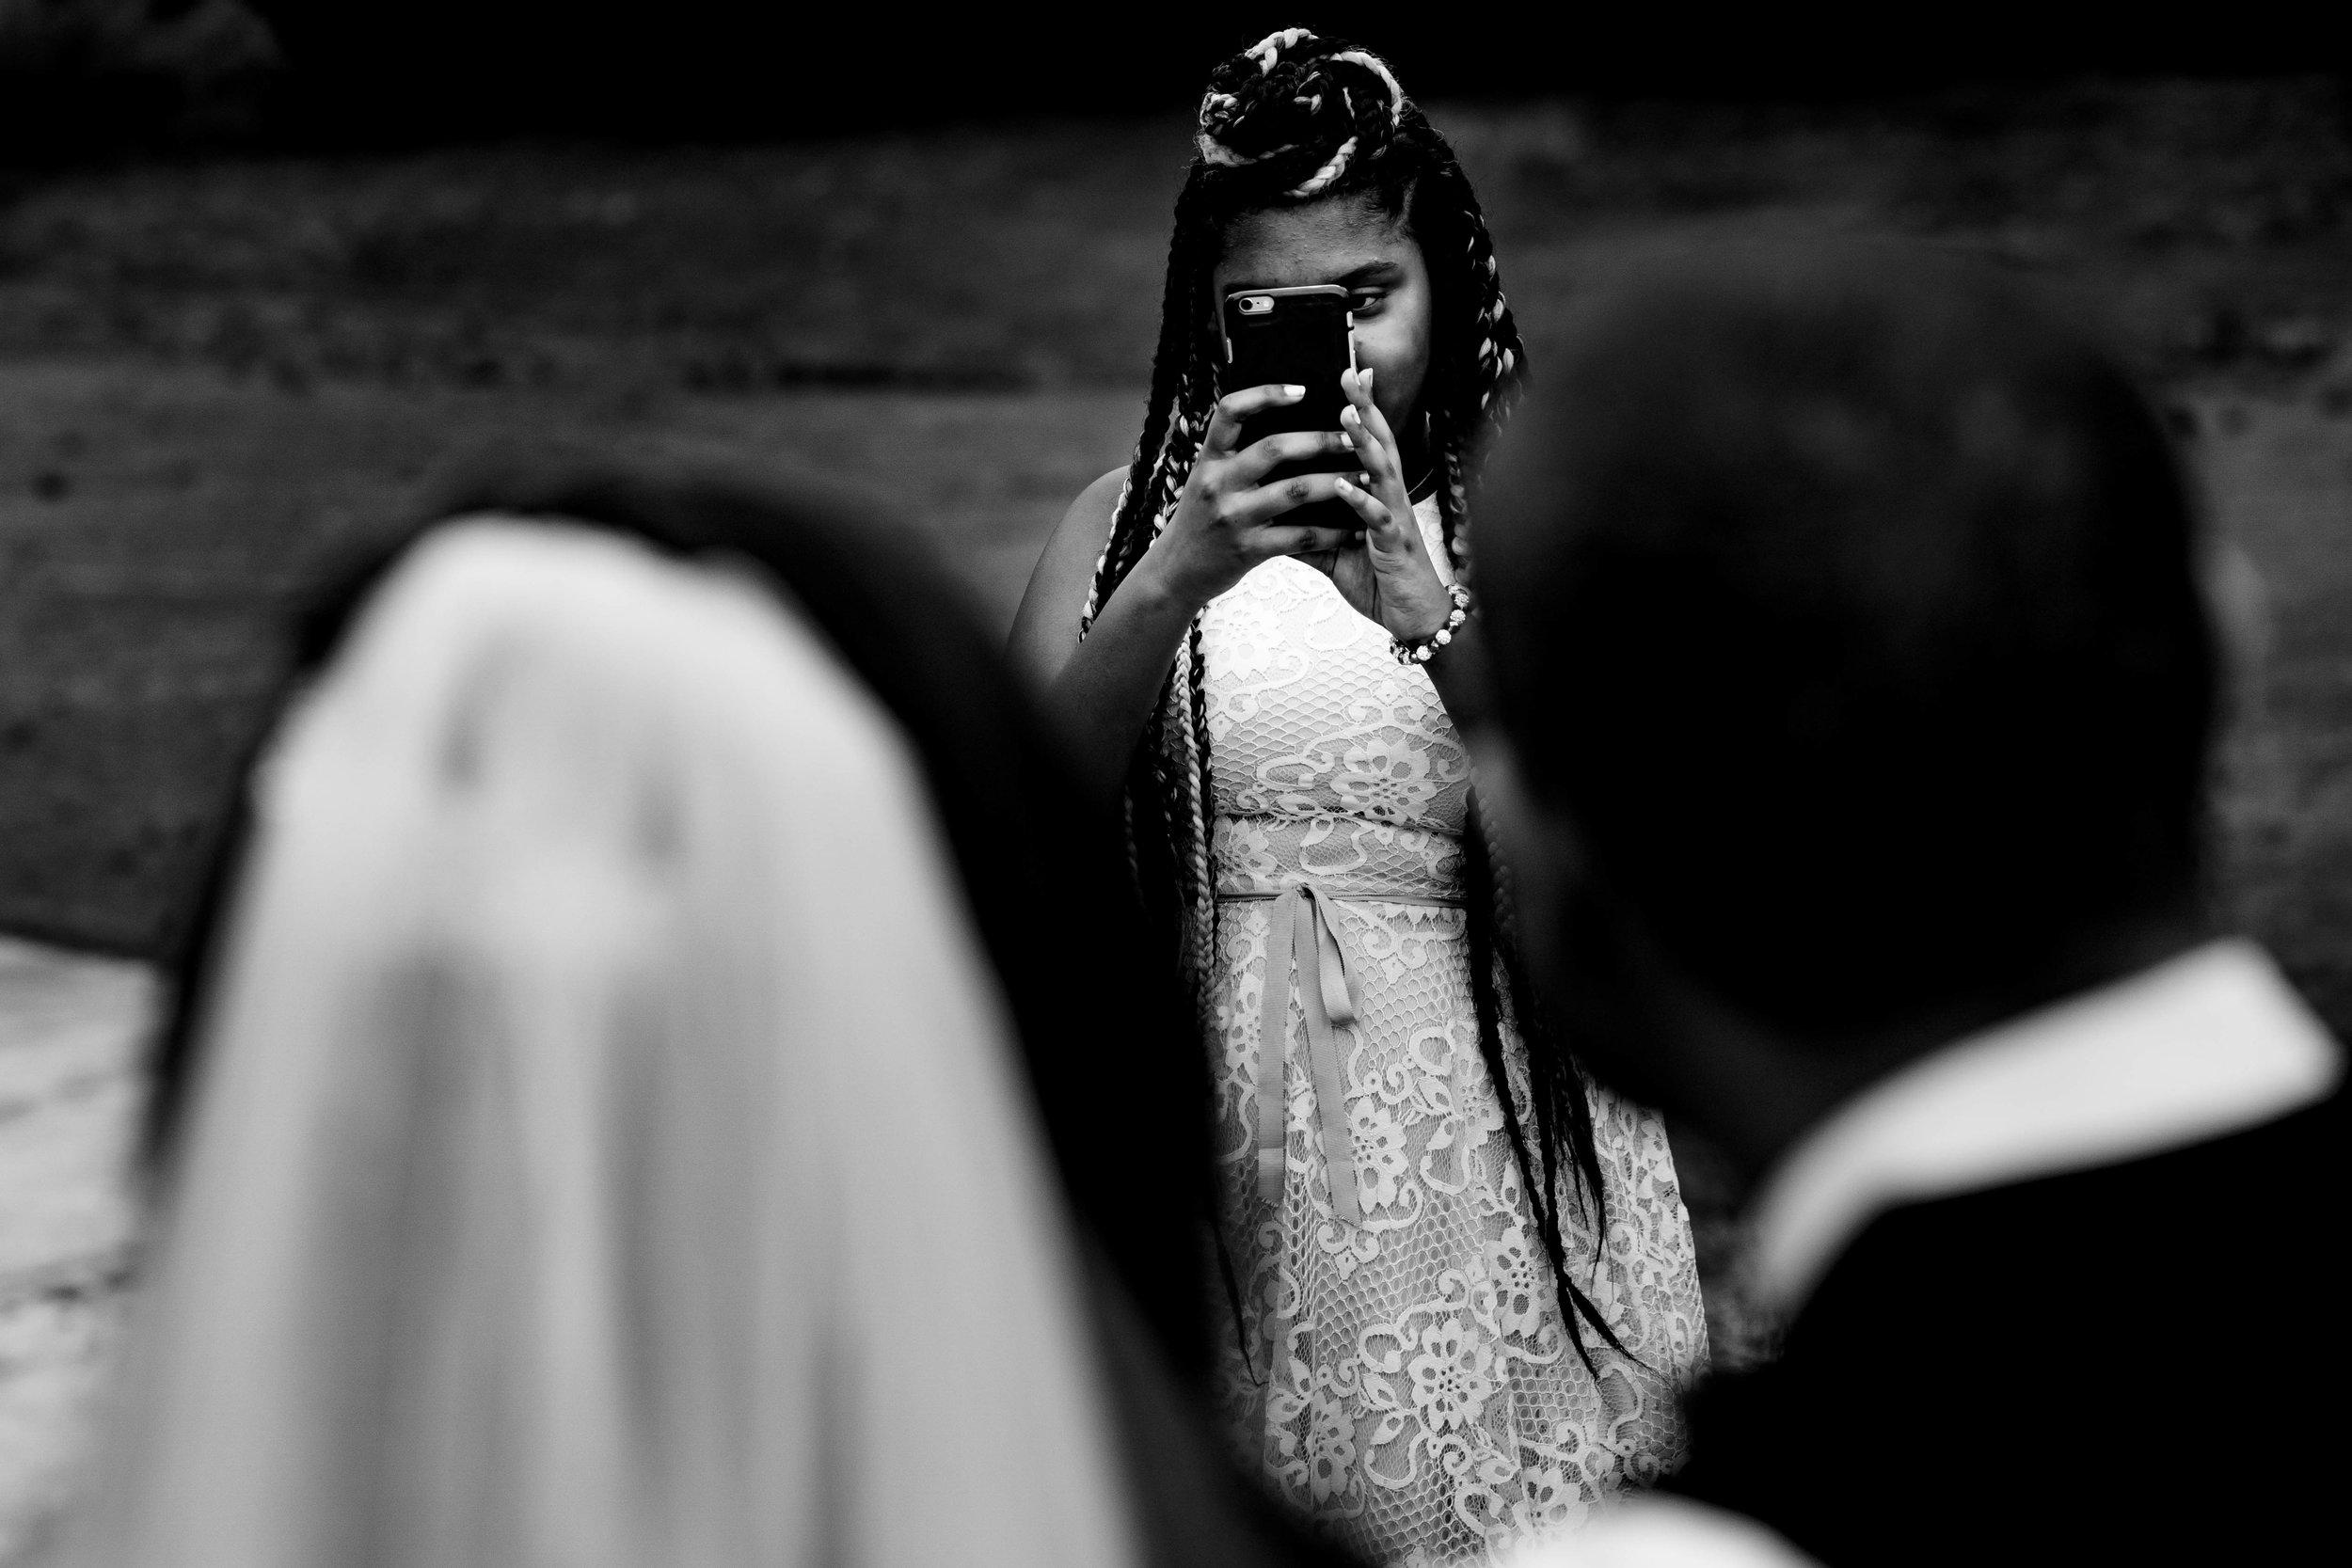 copper-ridge-on-the-neuse-wedding-001tephanie&Roberto-Wedding-464.jpg